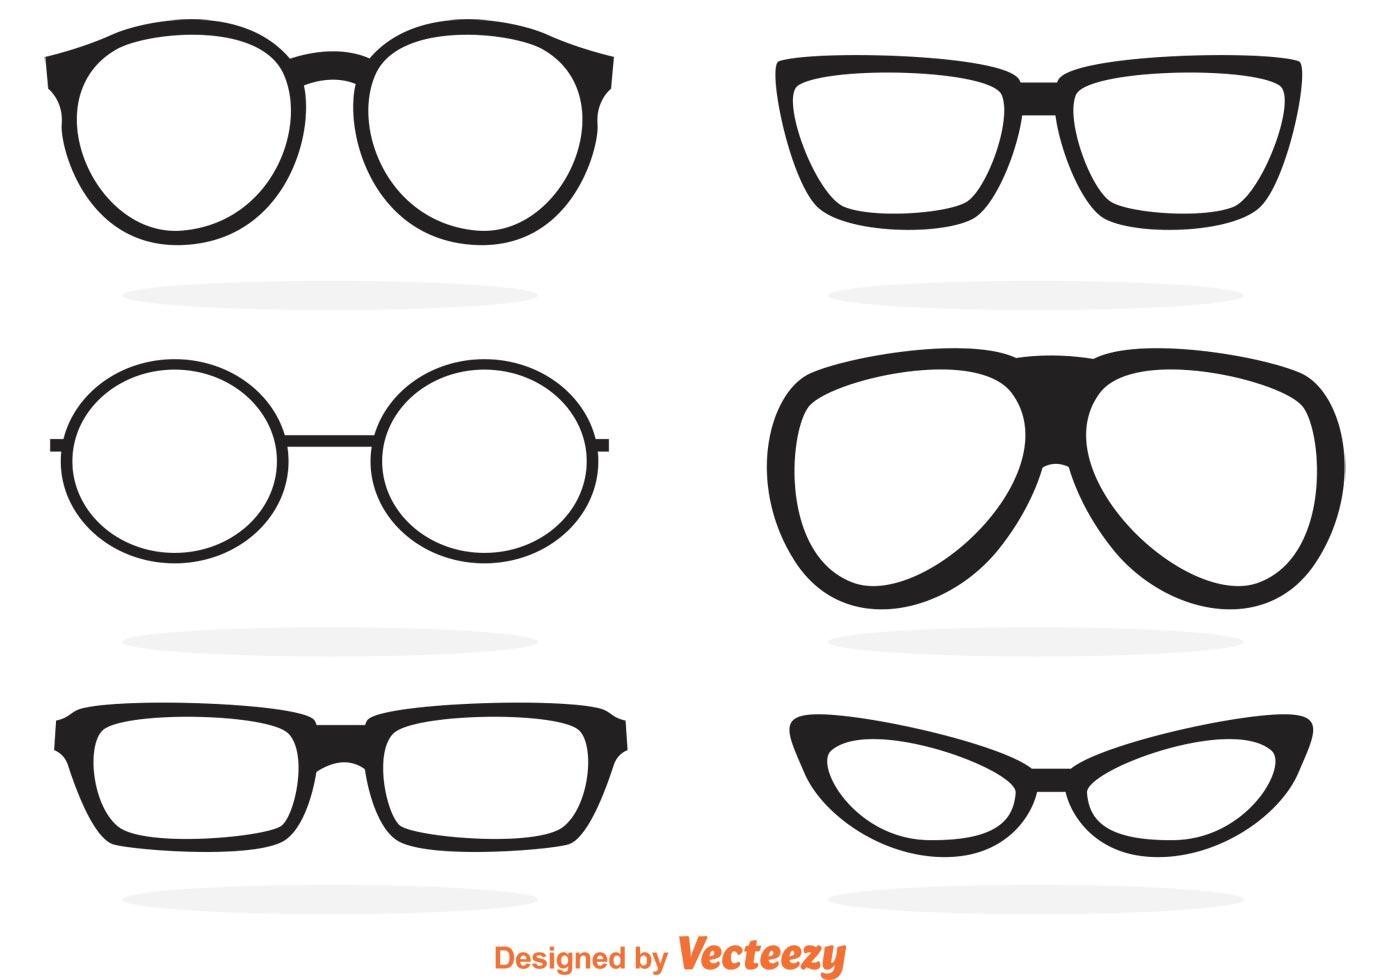 glasses free vector art  4997 free downloads Eye Doctor Logo eye doctor clipart free printabl